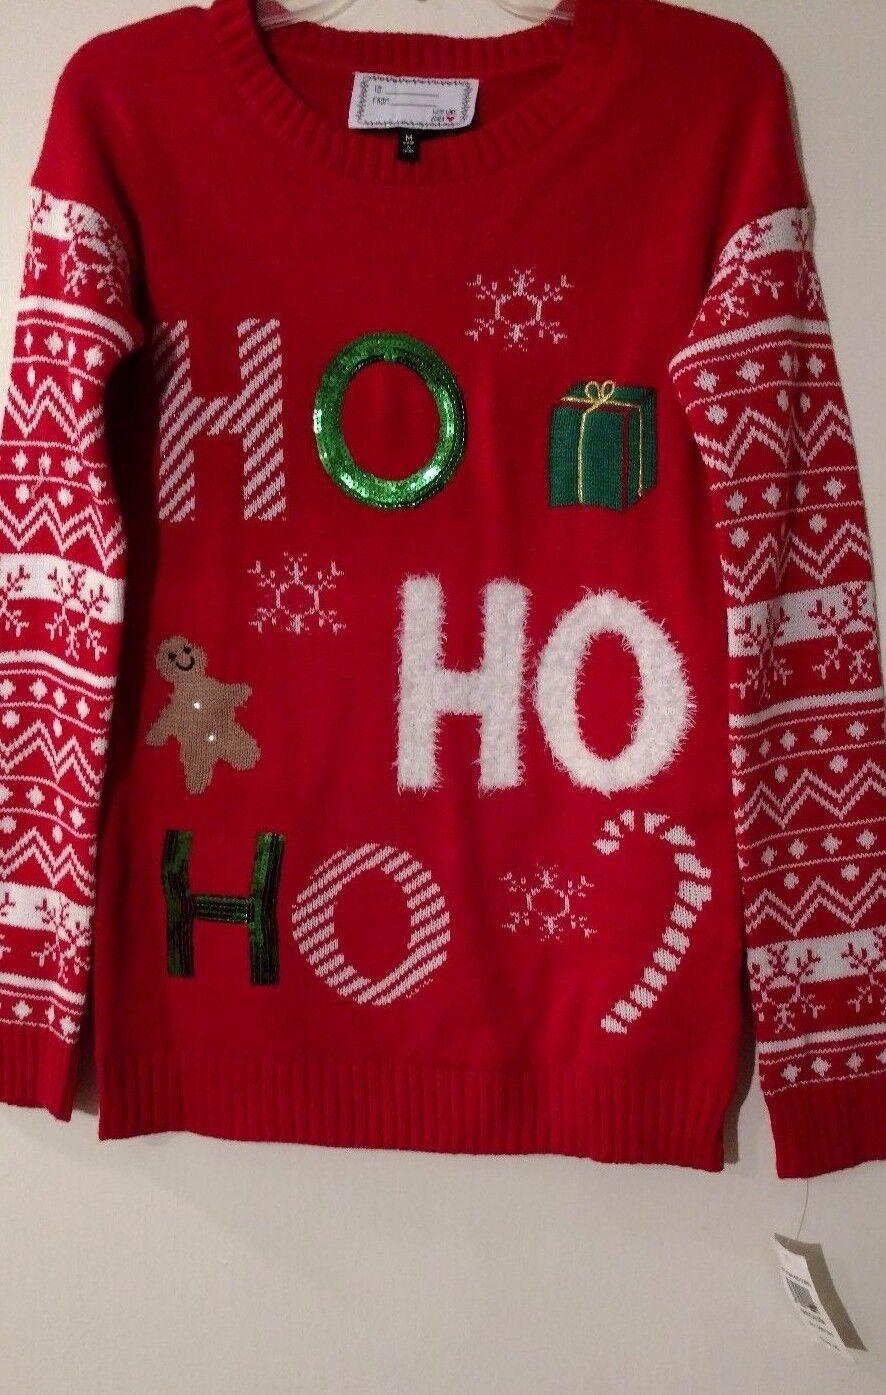 Womens Sweater Red Derek Heart Gingerbread Gingerbread Gingerbread Man Snowflakes Ho Ho Ho Soft Knit M fef08e